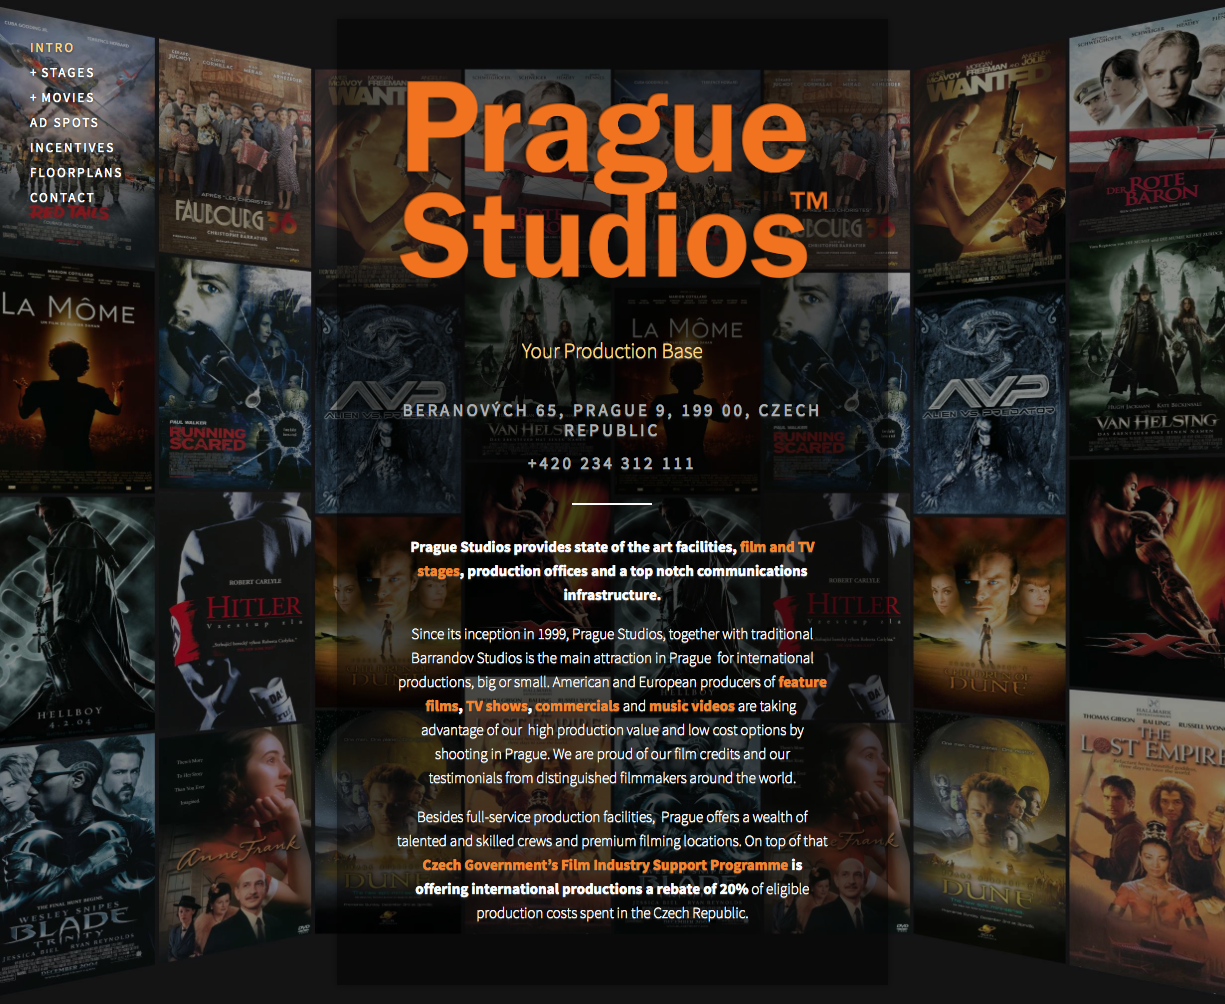 Prague Studios' new website